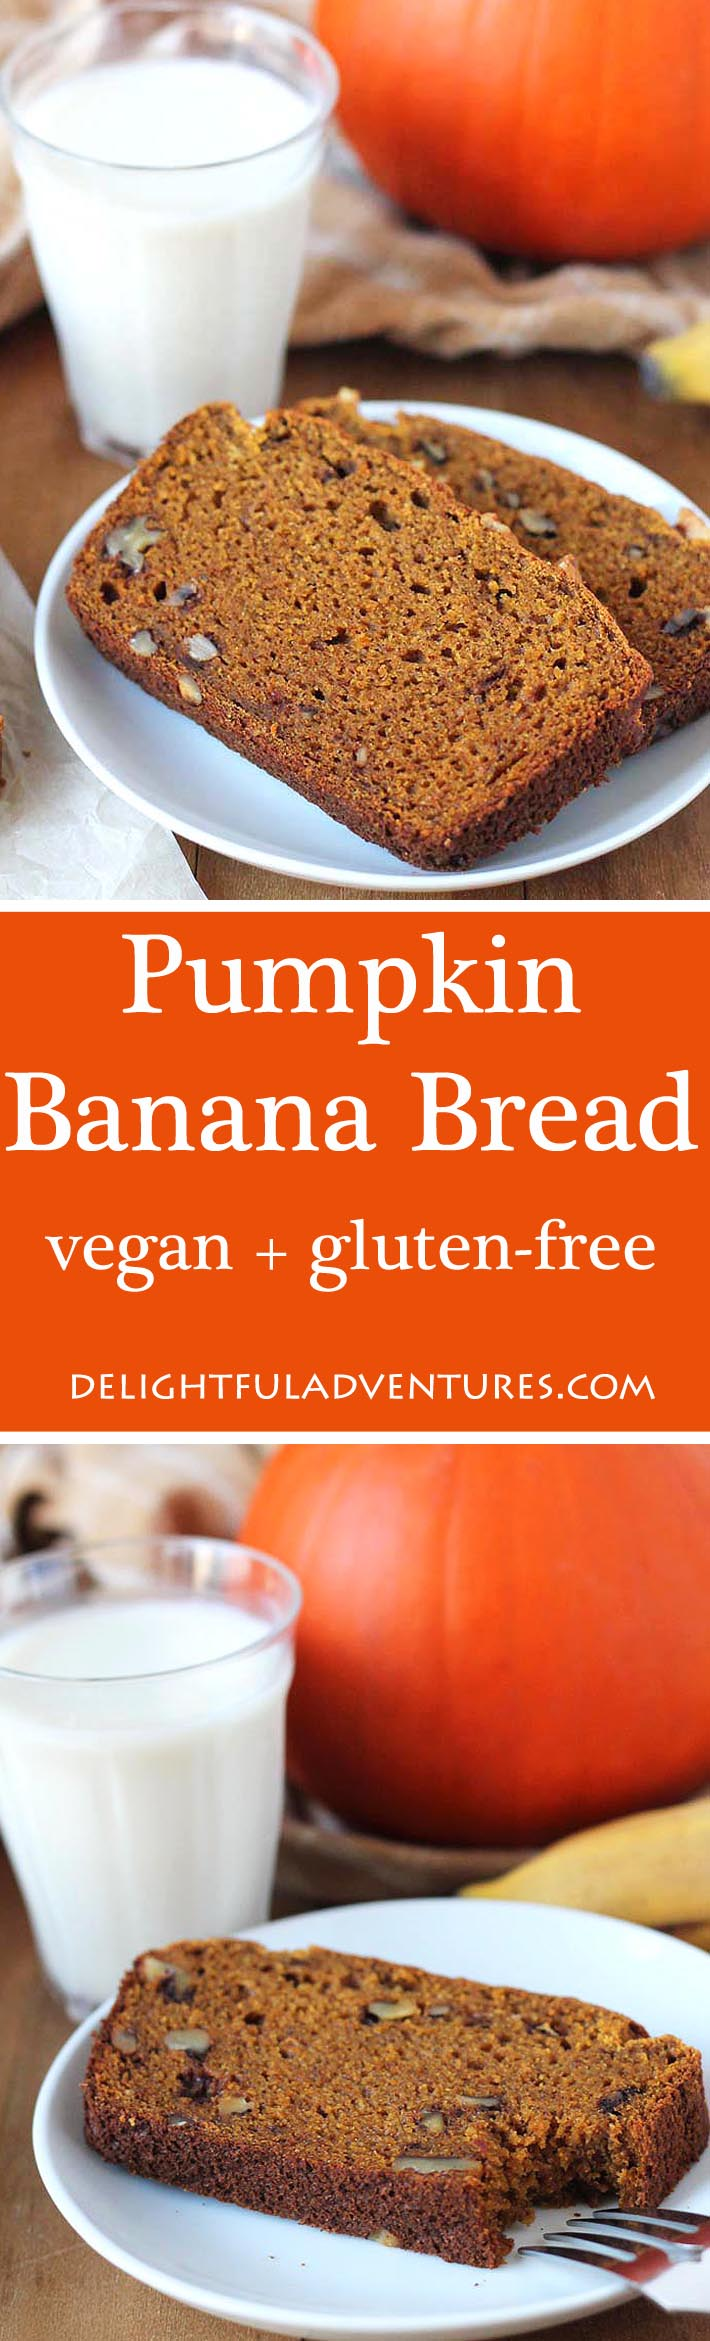 Can't decide between banana bread and pumpkin bread? Then make this Vegan Gluten Free Pumpkin Banana Bread which blends the flavours of both, perfectly. #vegan #veganglutenfree #pumpkinbread #bananabread #pumpkinbananabread